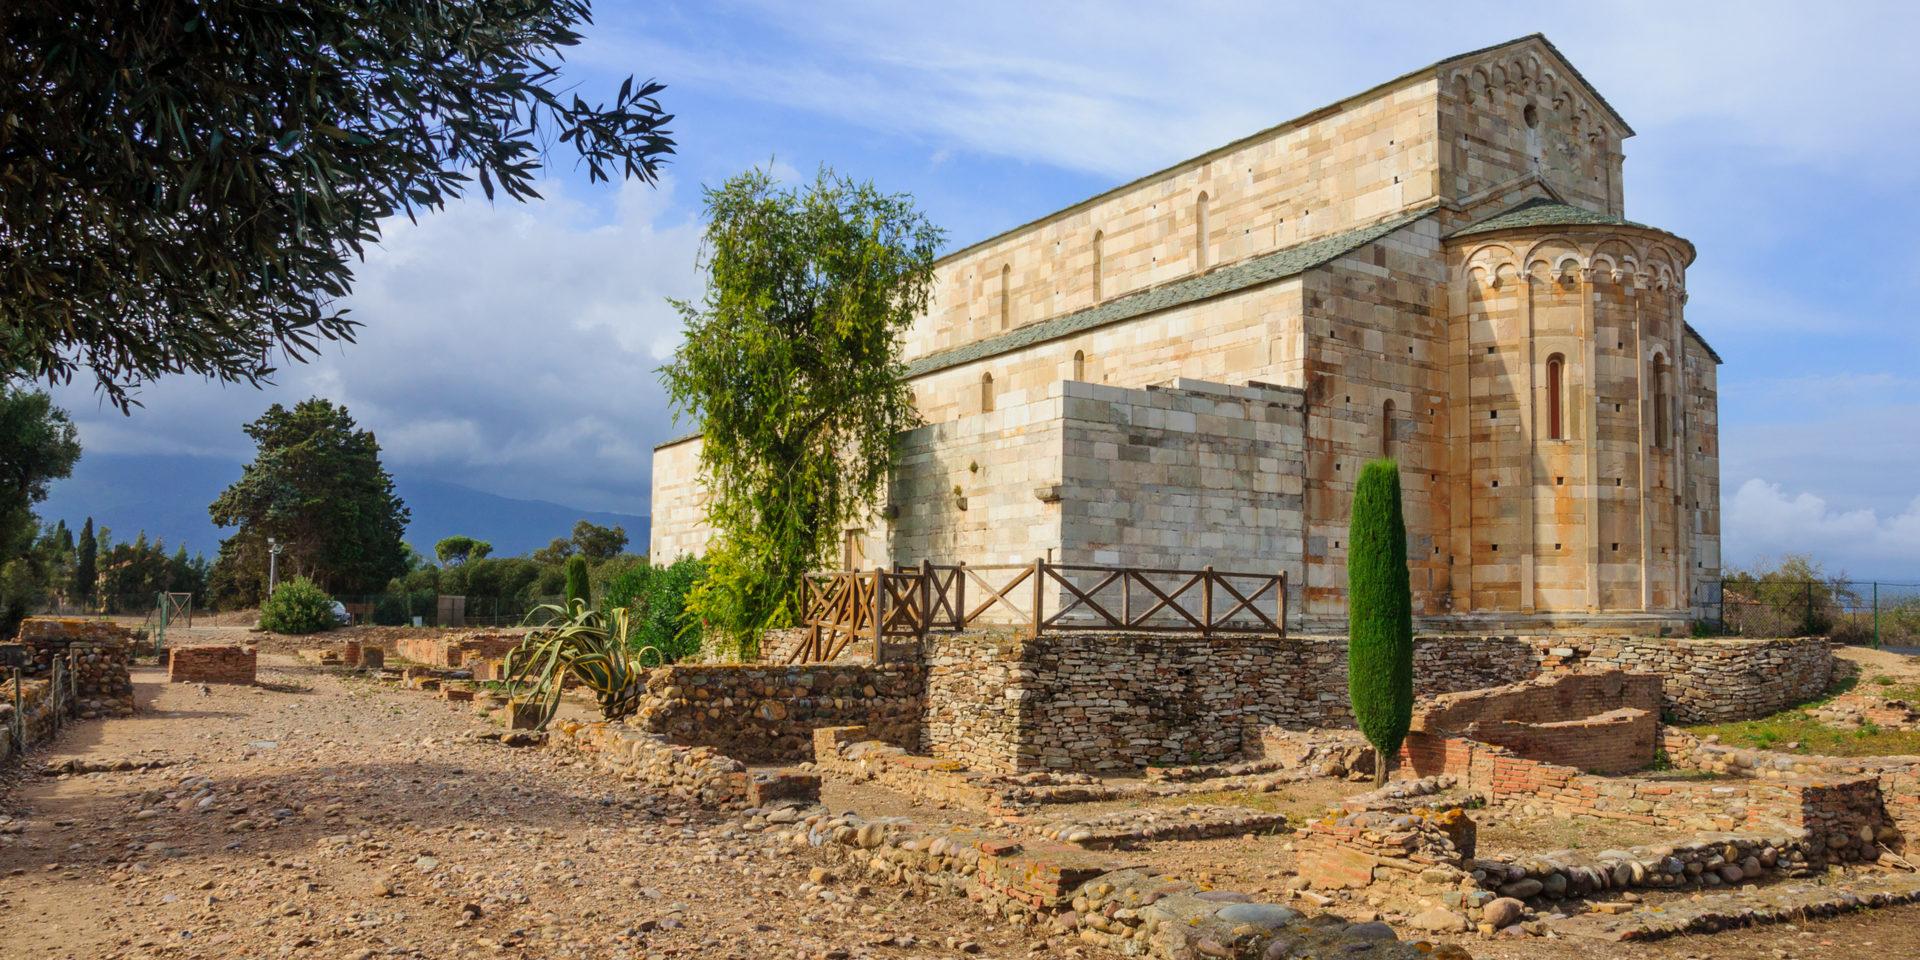 La-Canonica Santa-Maria-Assunta Bastia Lucciana Corsica Frankrijk kathedraal Romaanse-kerk Mariana Romeinse-kolonie